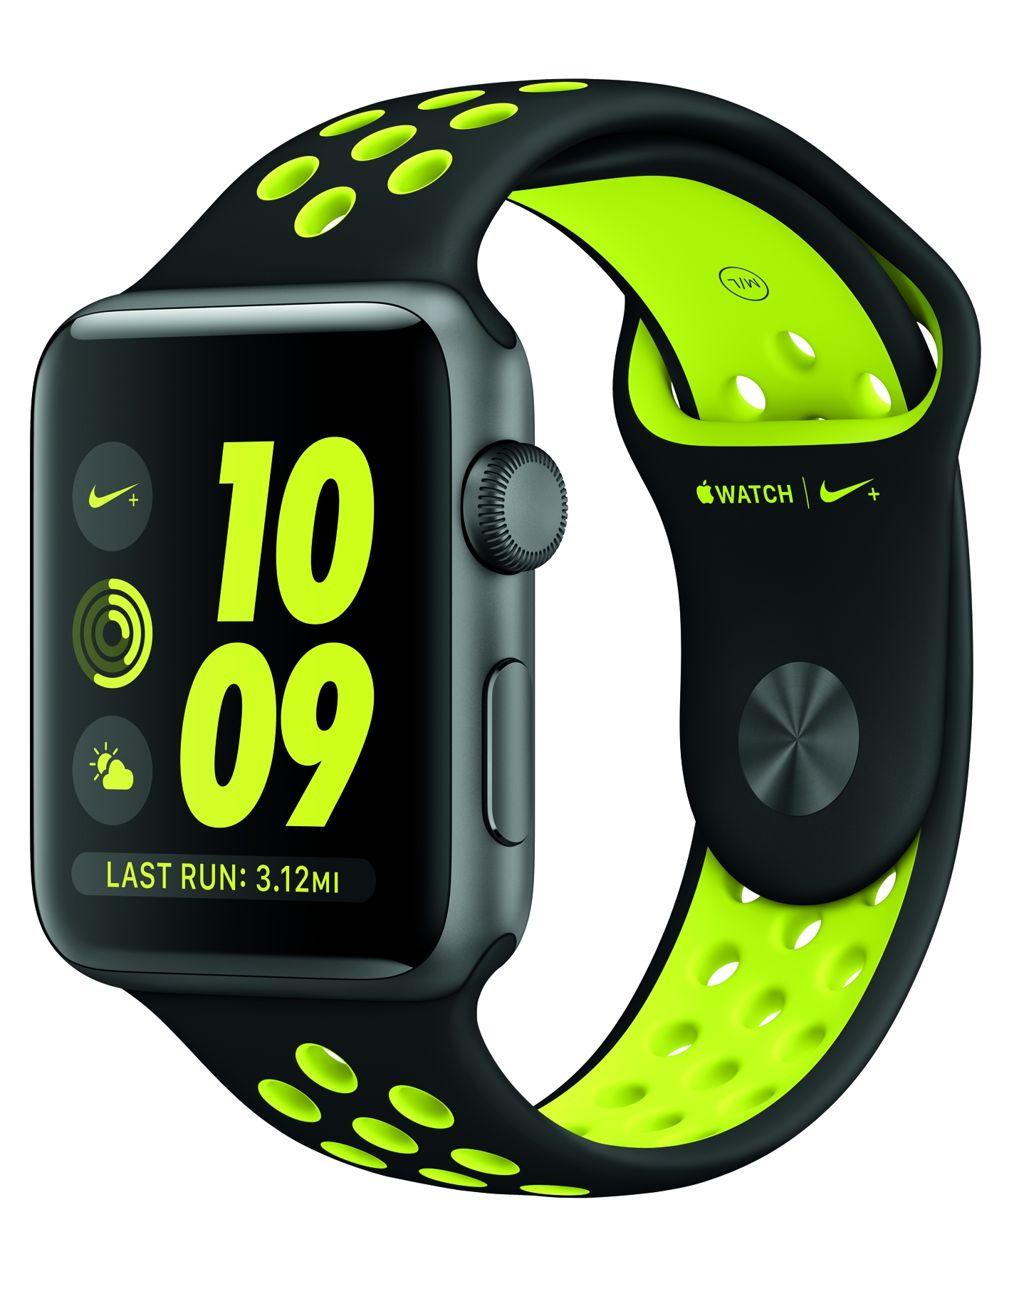 Сравнение apple watch series 2 42mm и apple watch series 1 sport 42mm.